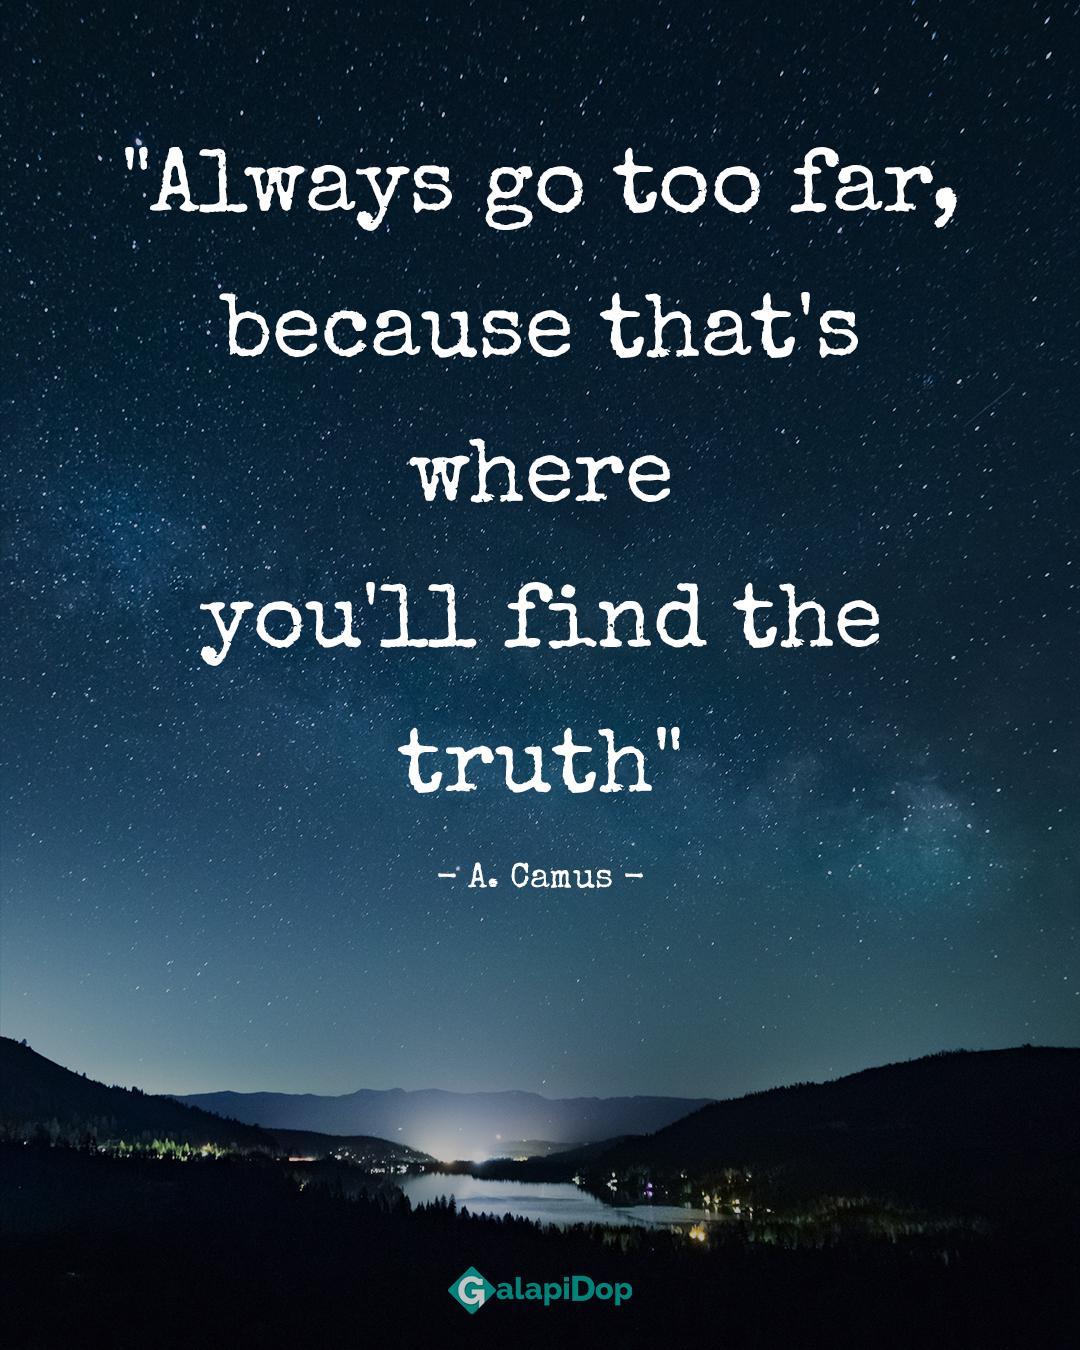 Always go too far, because that's where – A. Camus (1080 x 1035)